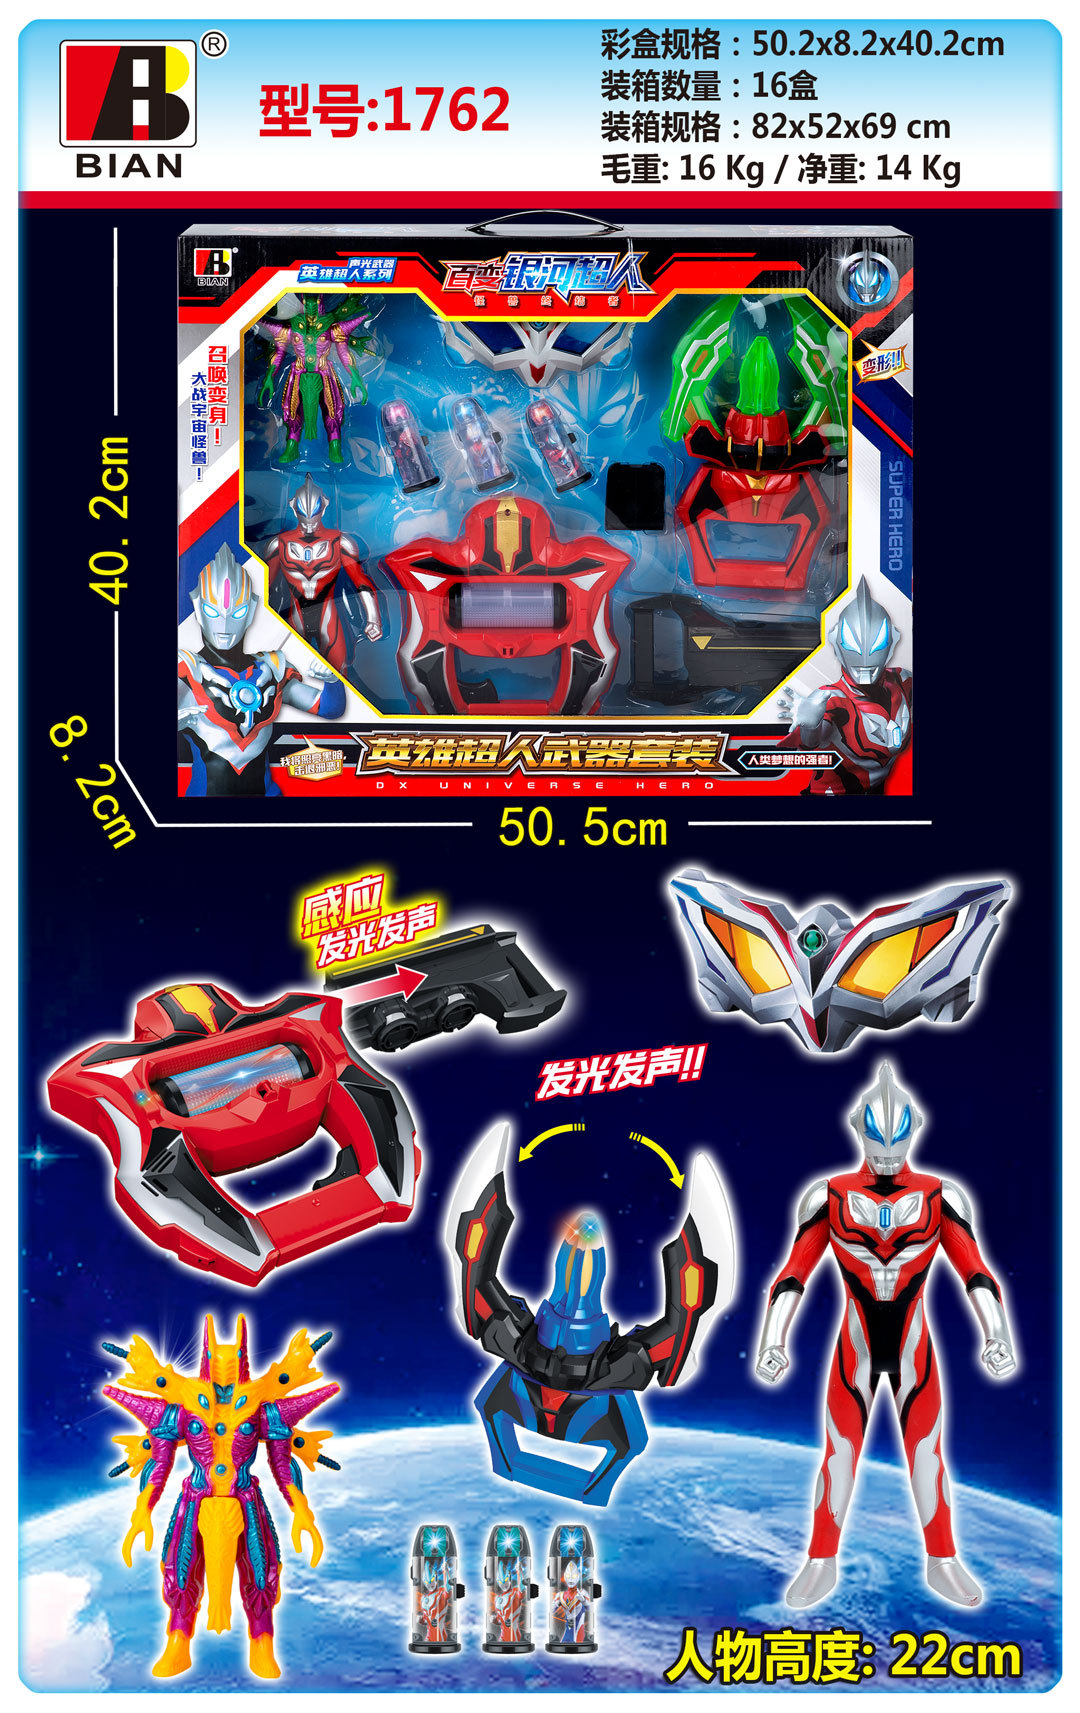 Ultraman Shining Sound Making Model Toy Robot 13 Movable Joint Galaxy Tiga Dynamo Superman Couple